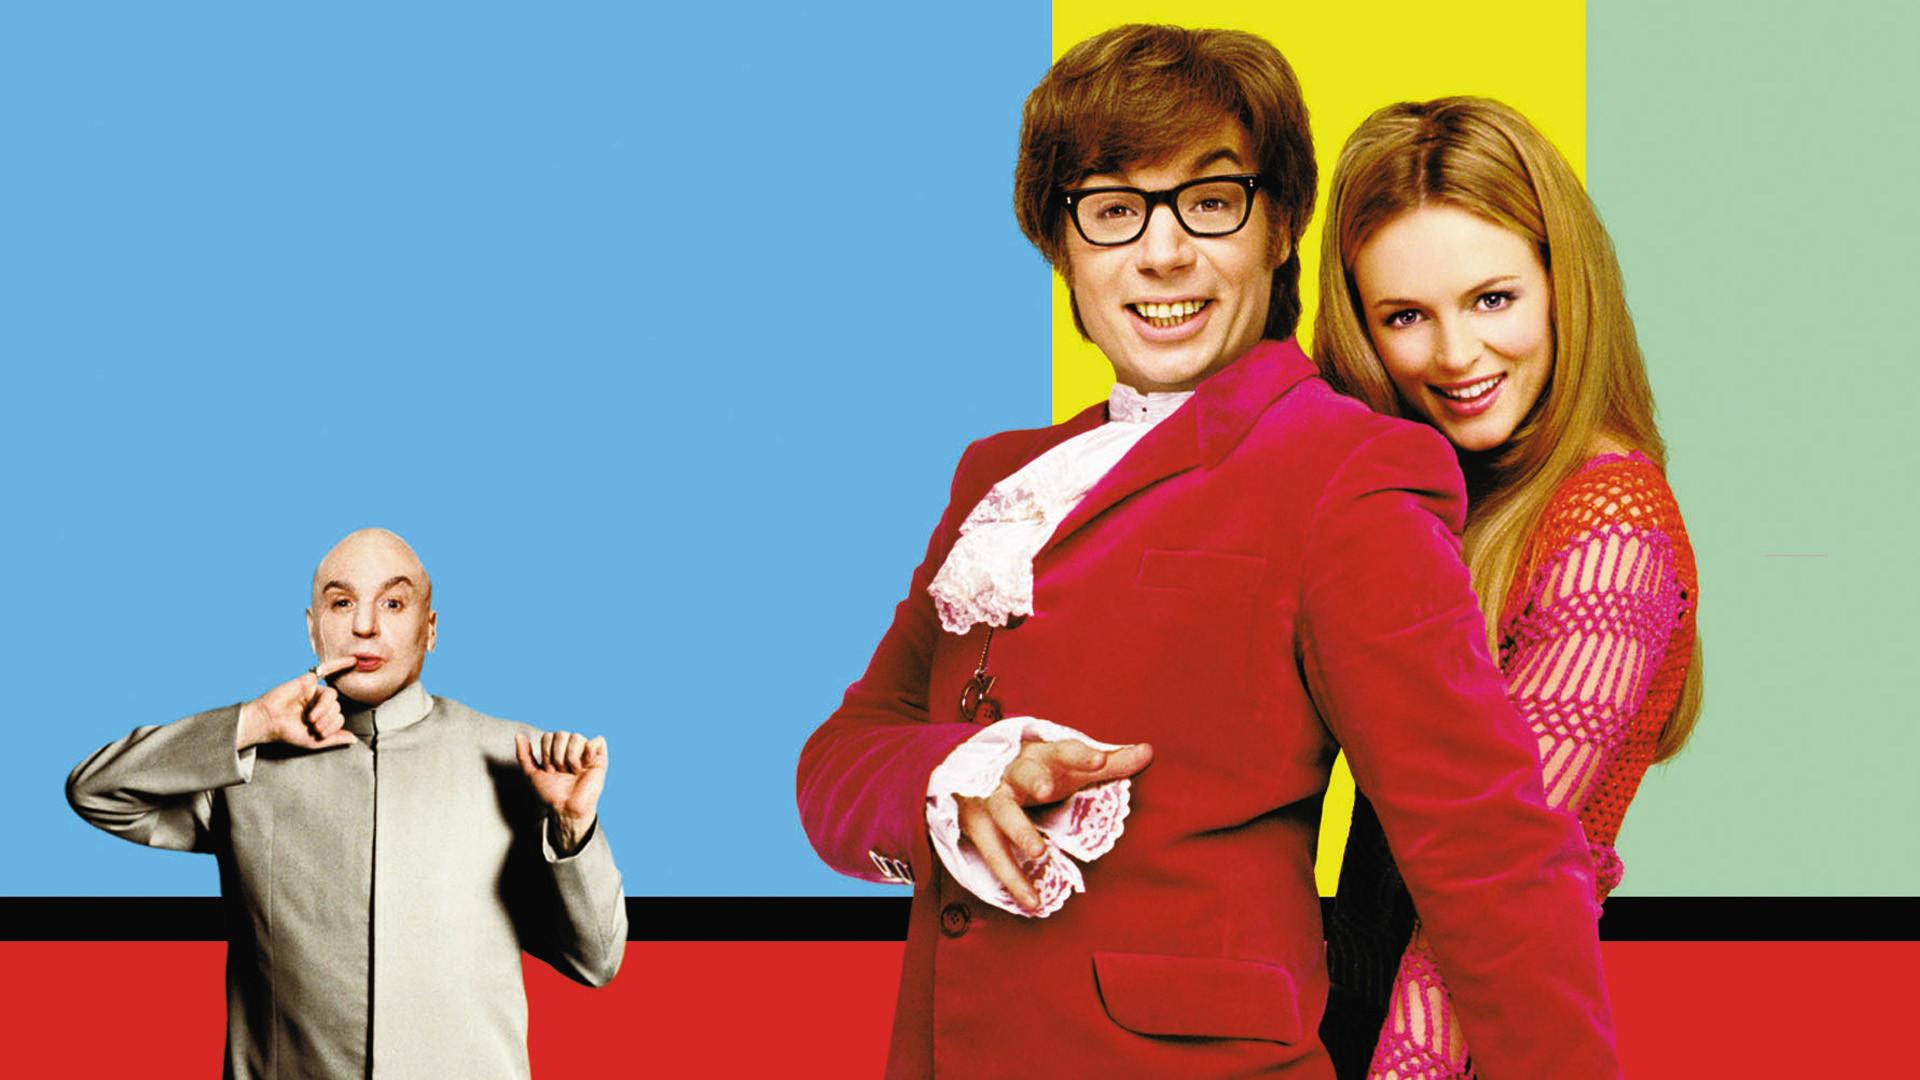 Austin Powers Film  TV Tropes